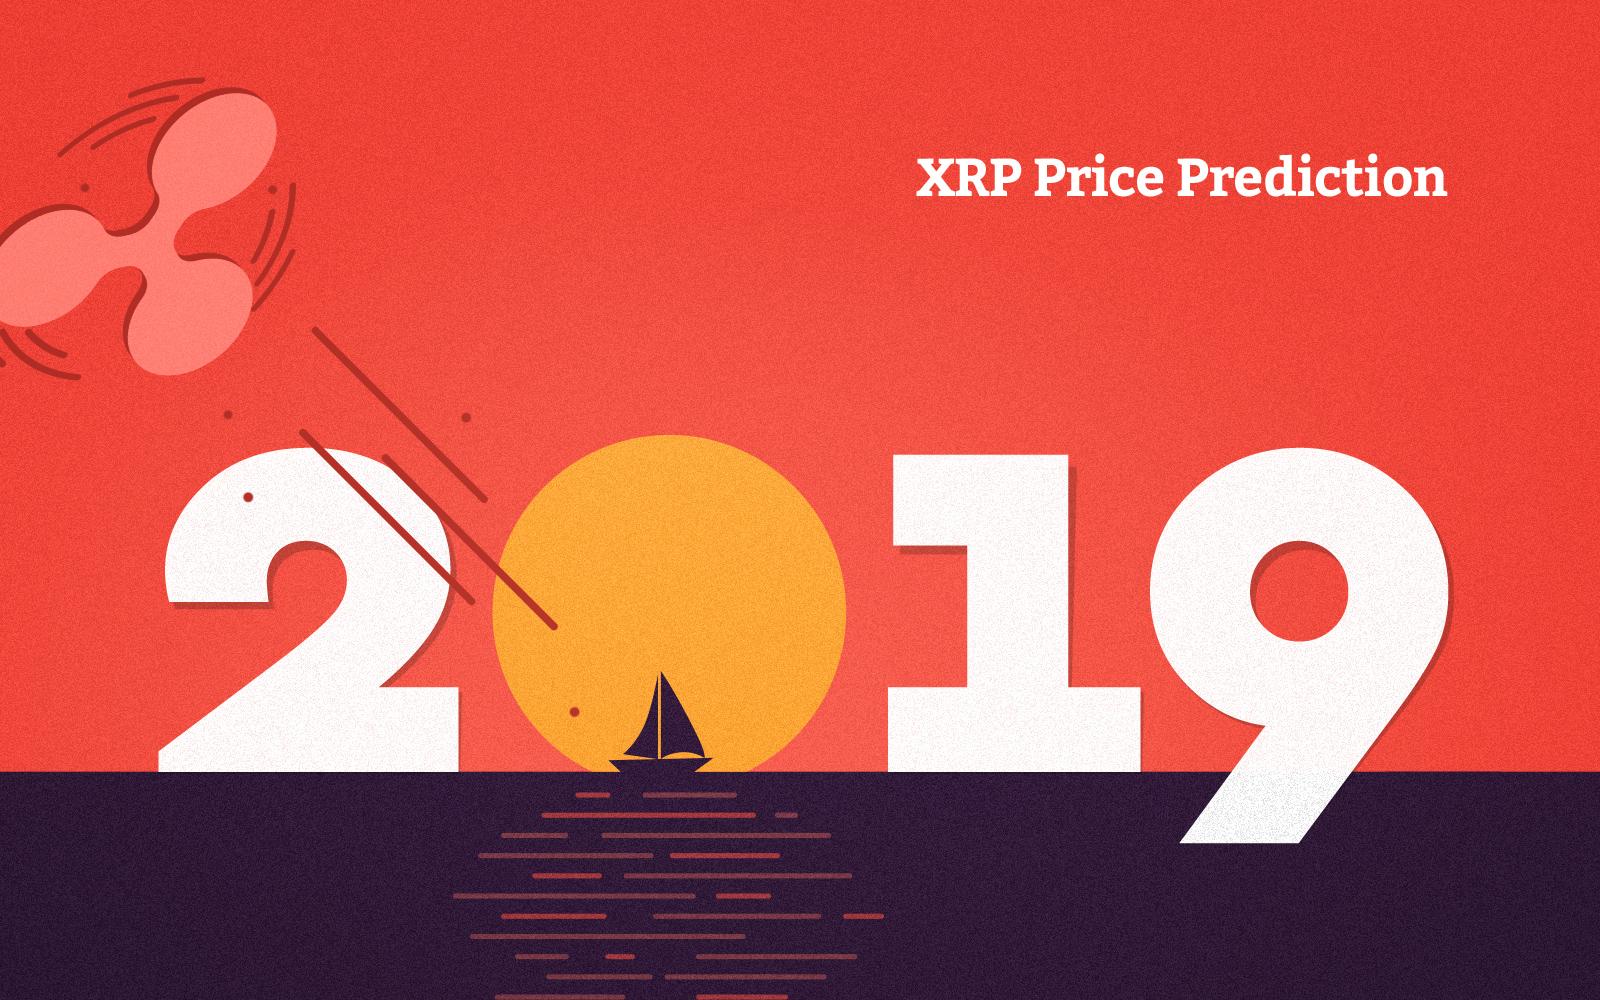 Ethereum Classic Price Prediction 2019 View Bitcoin Core Logs